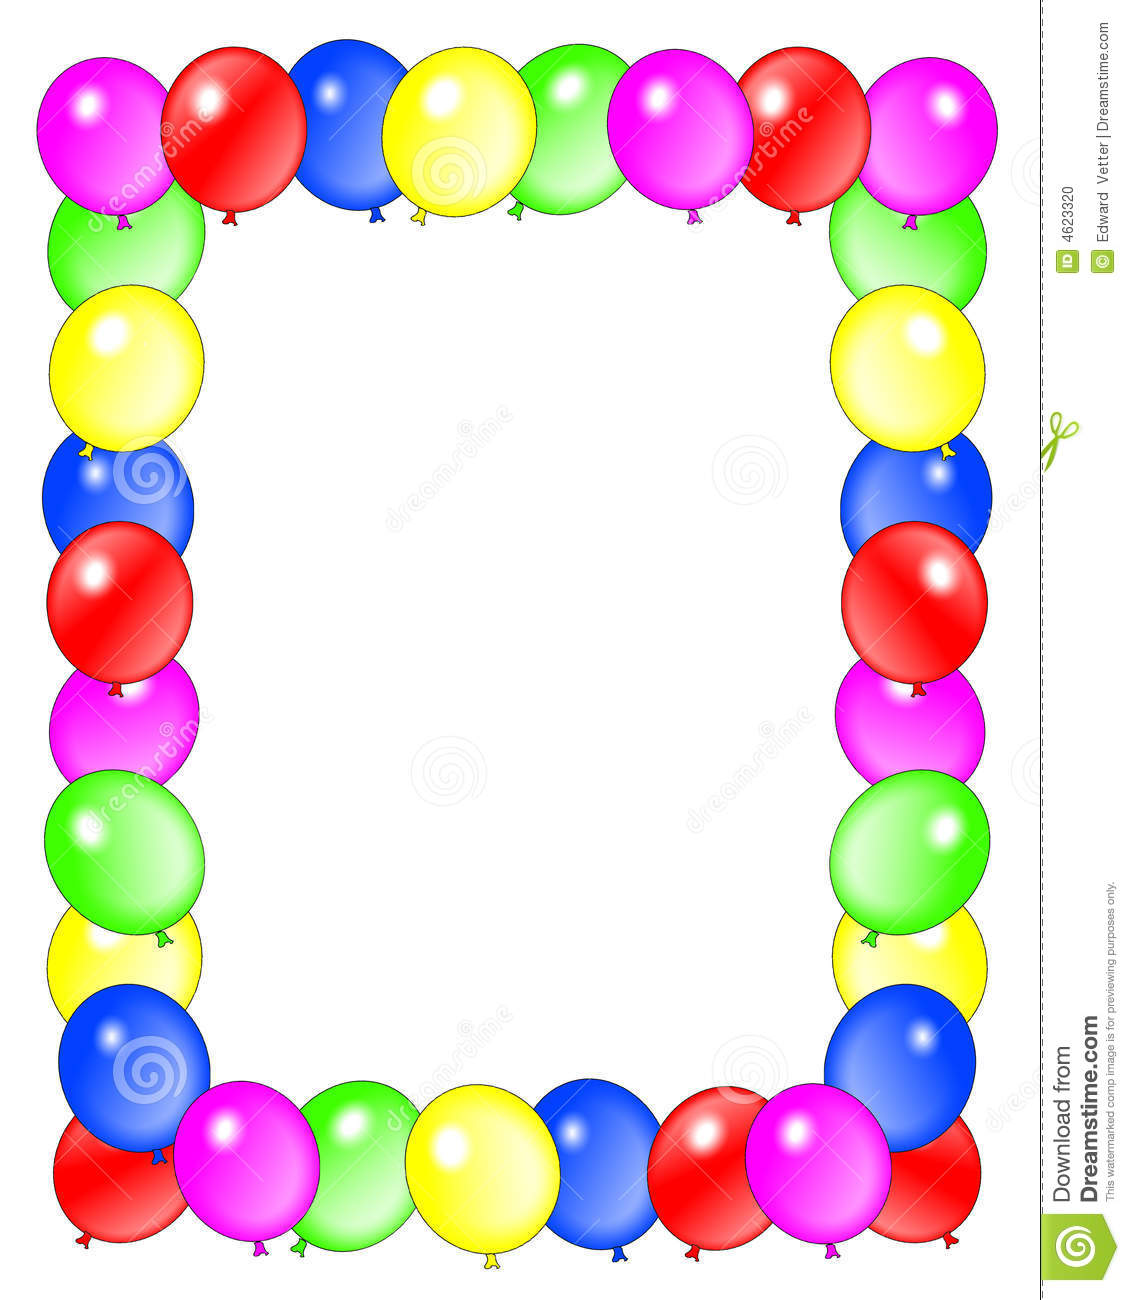 birthday clip art borders - Birthday Clip Art Borders